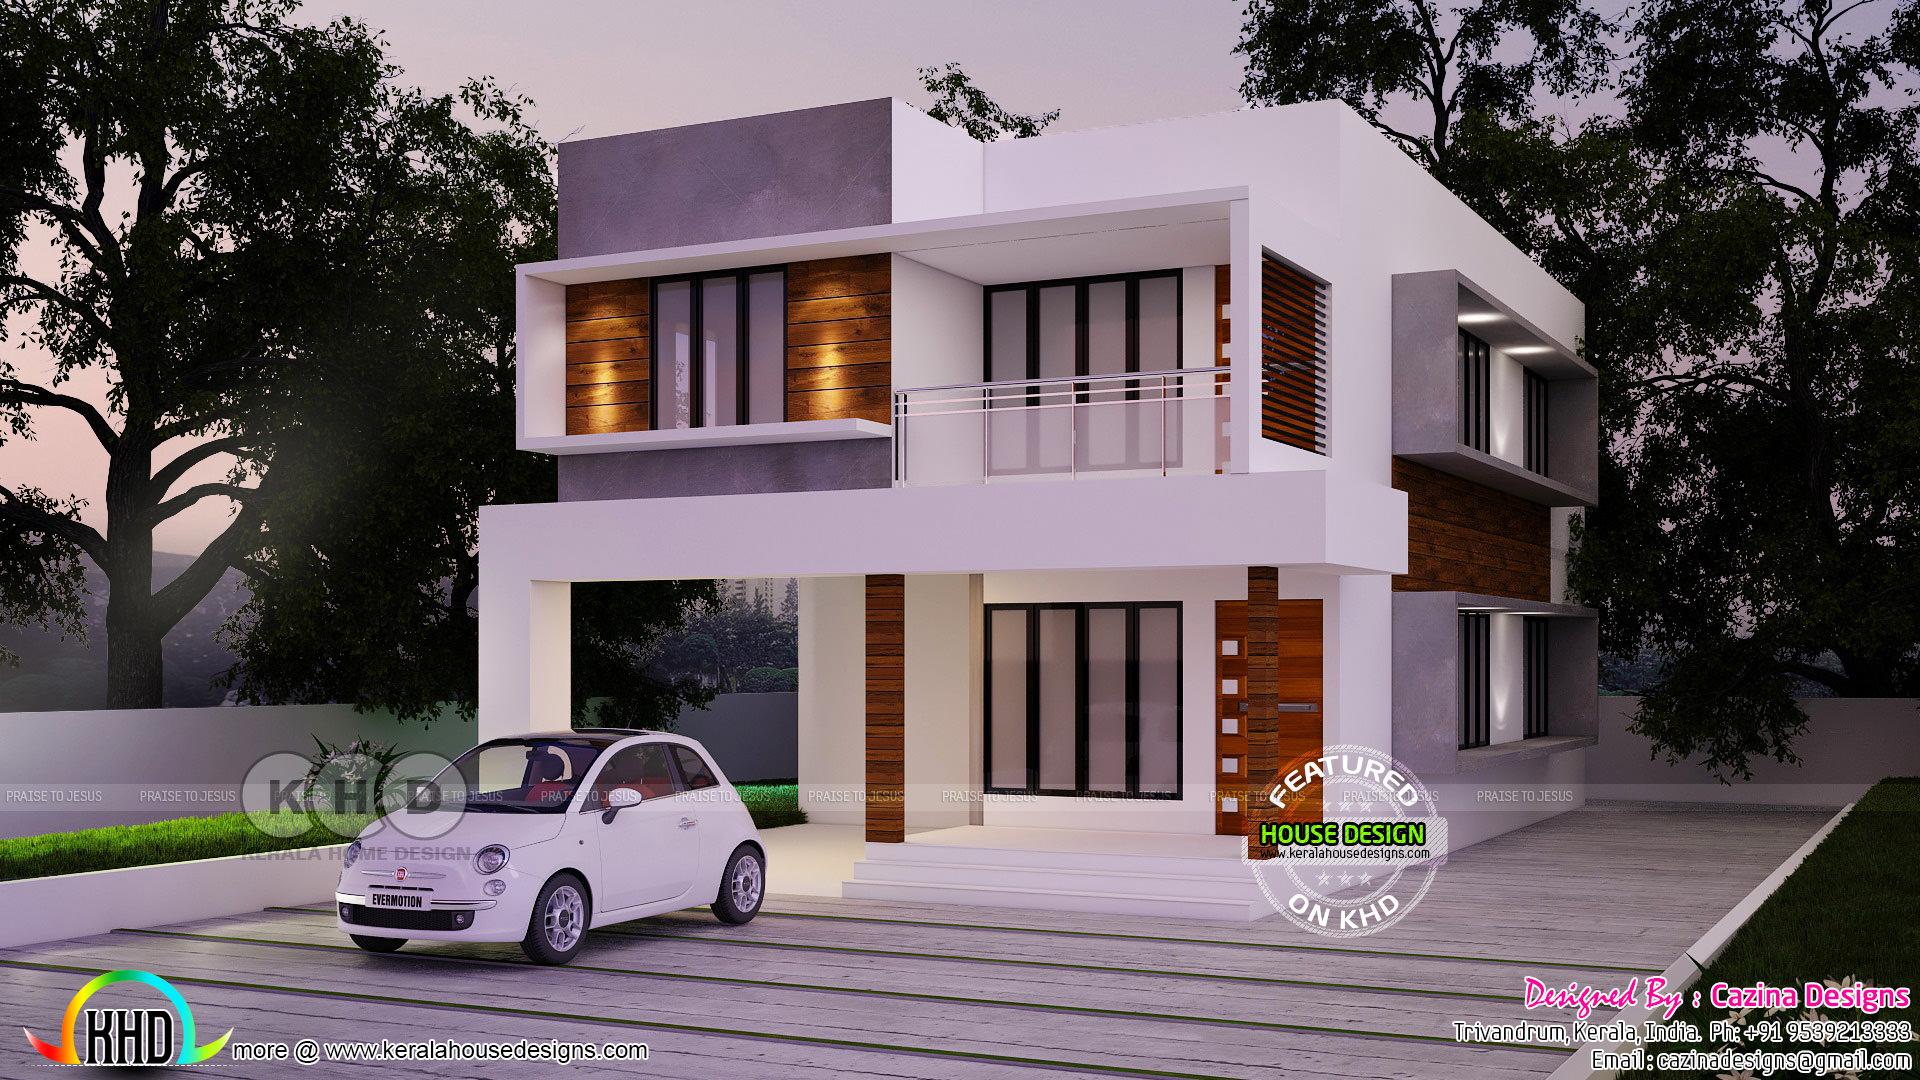 Cute 4 bhk modern home design kerala home design and for 4 bhk home design